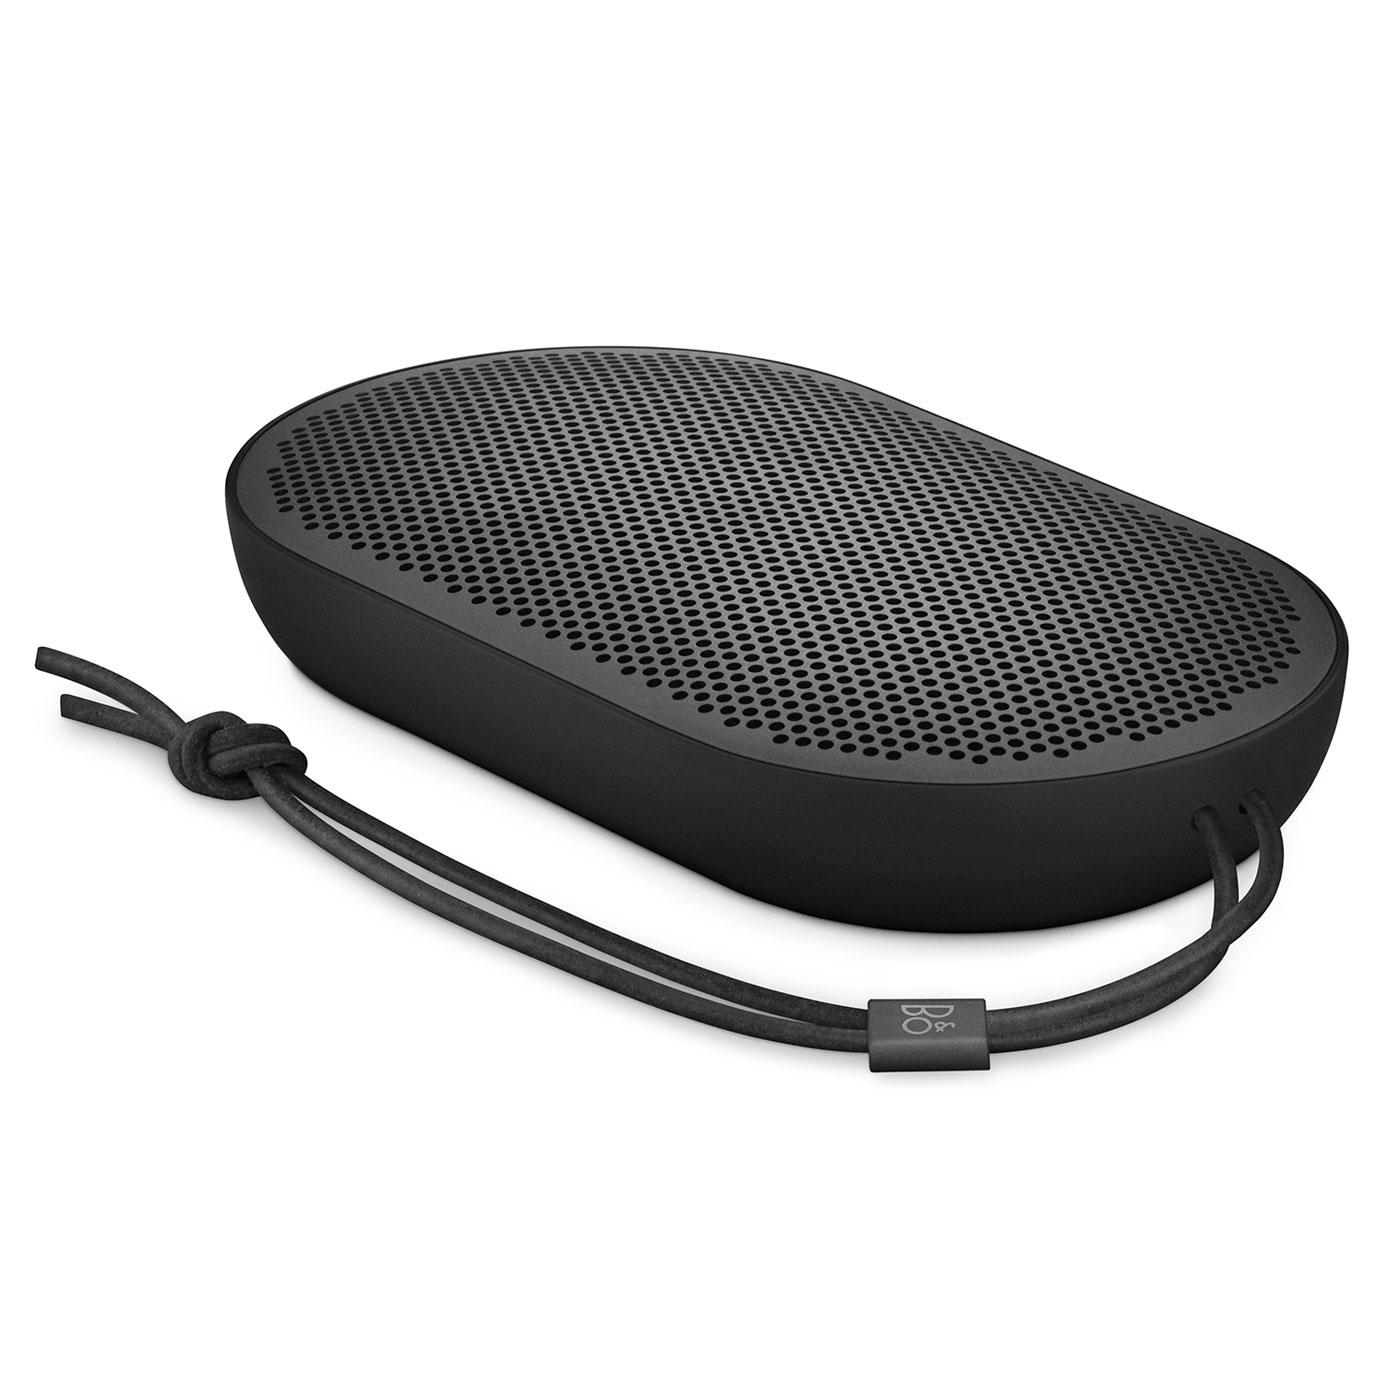 Dock & Enceinte Bluetooth Bang & Olufsen Beoplay P2 Noir Enceinte portable Bluetooth 2 x 15W avec micro intégré